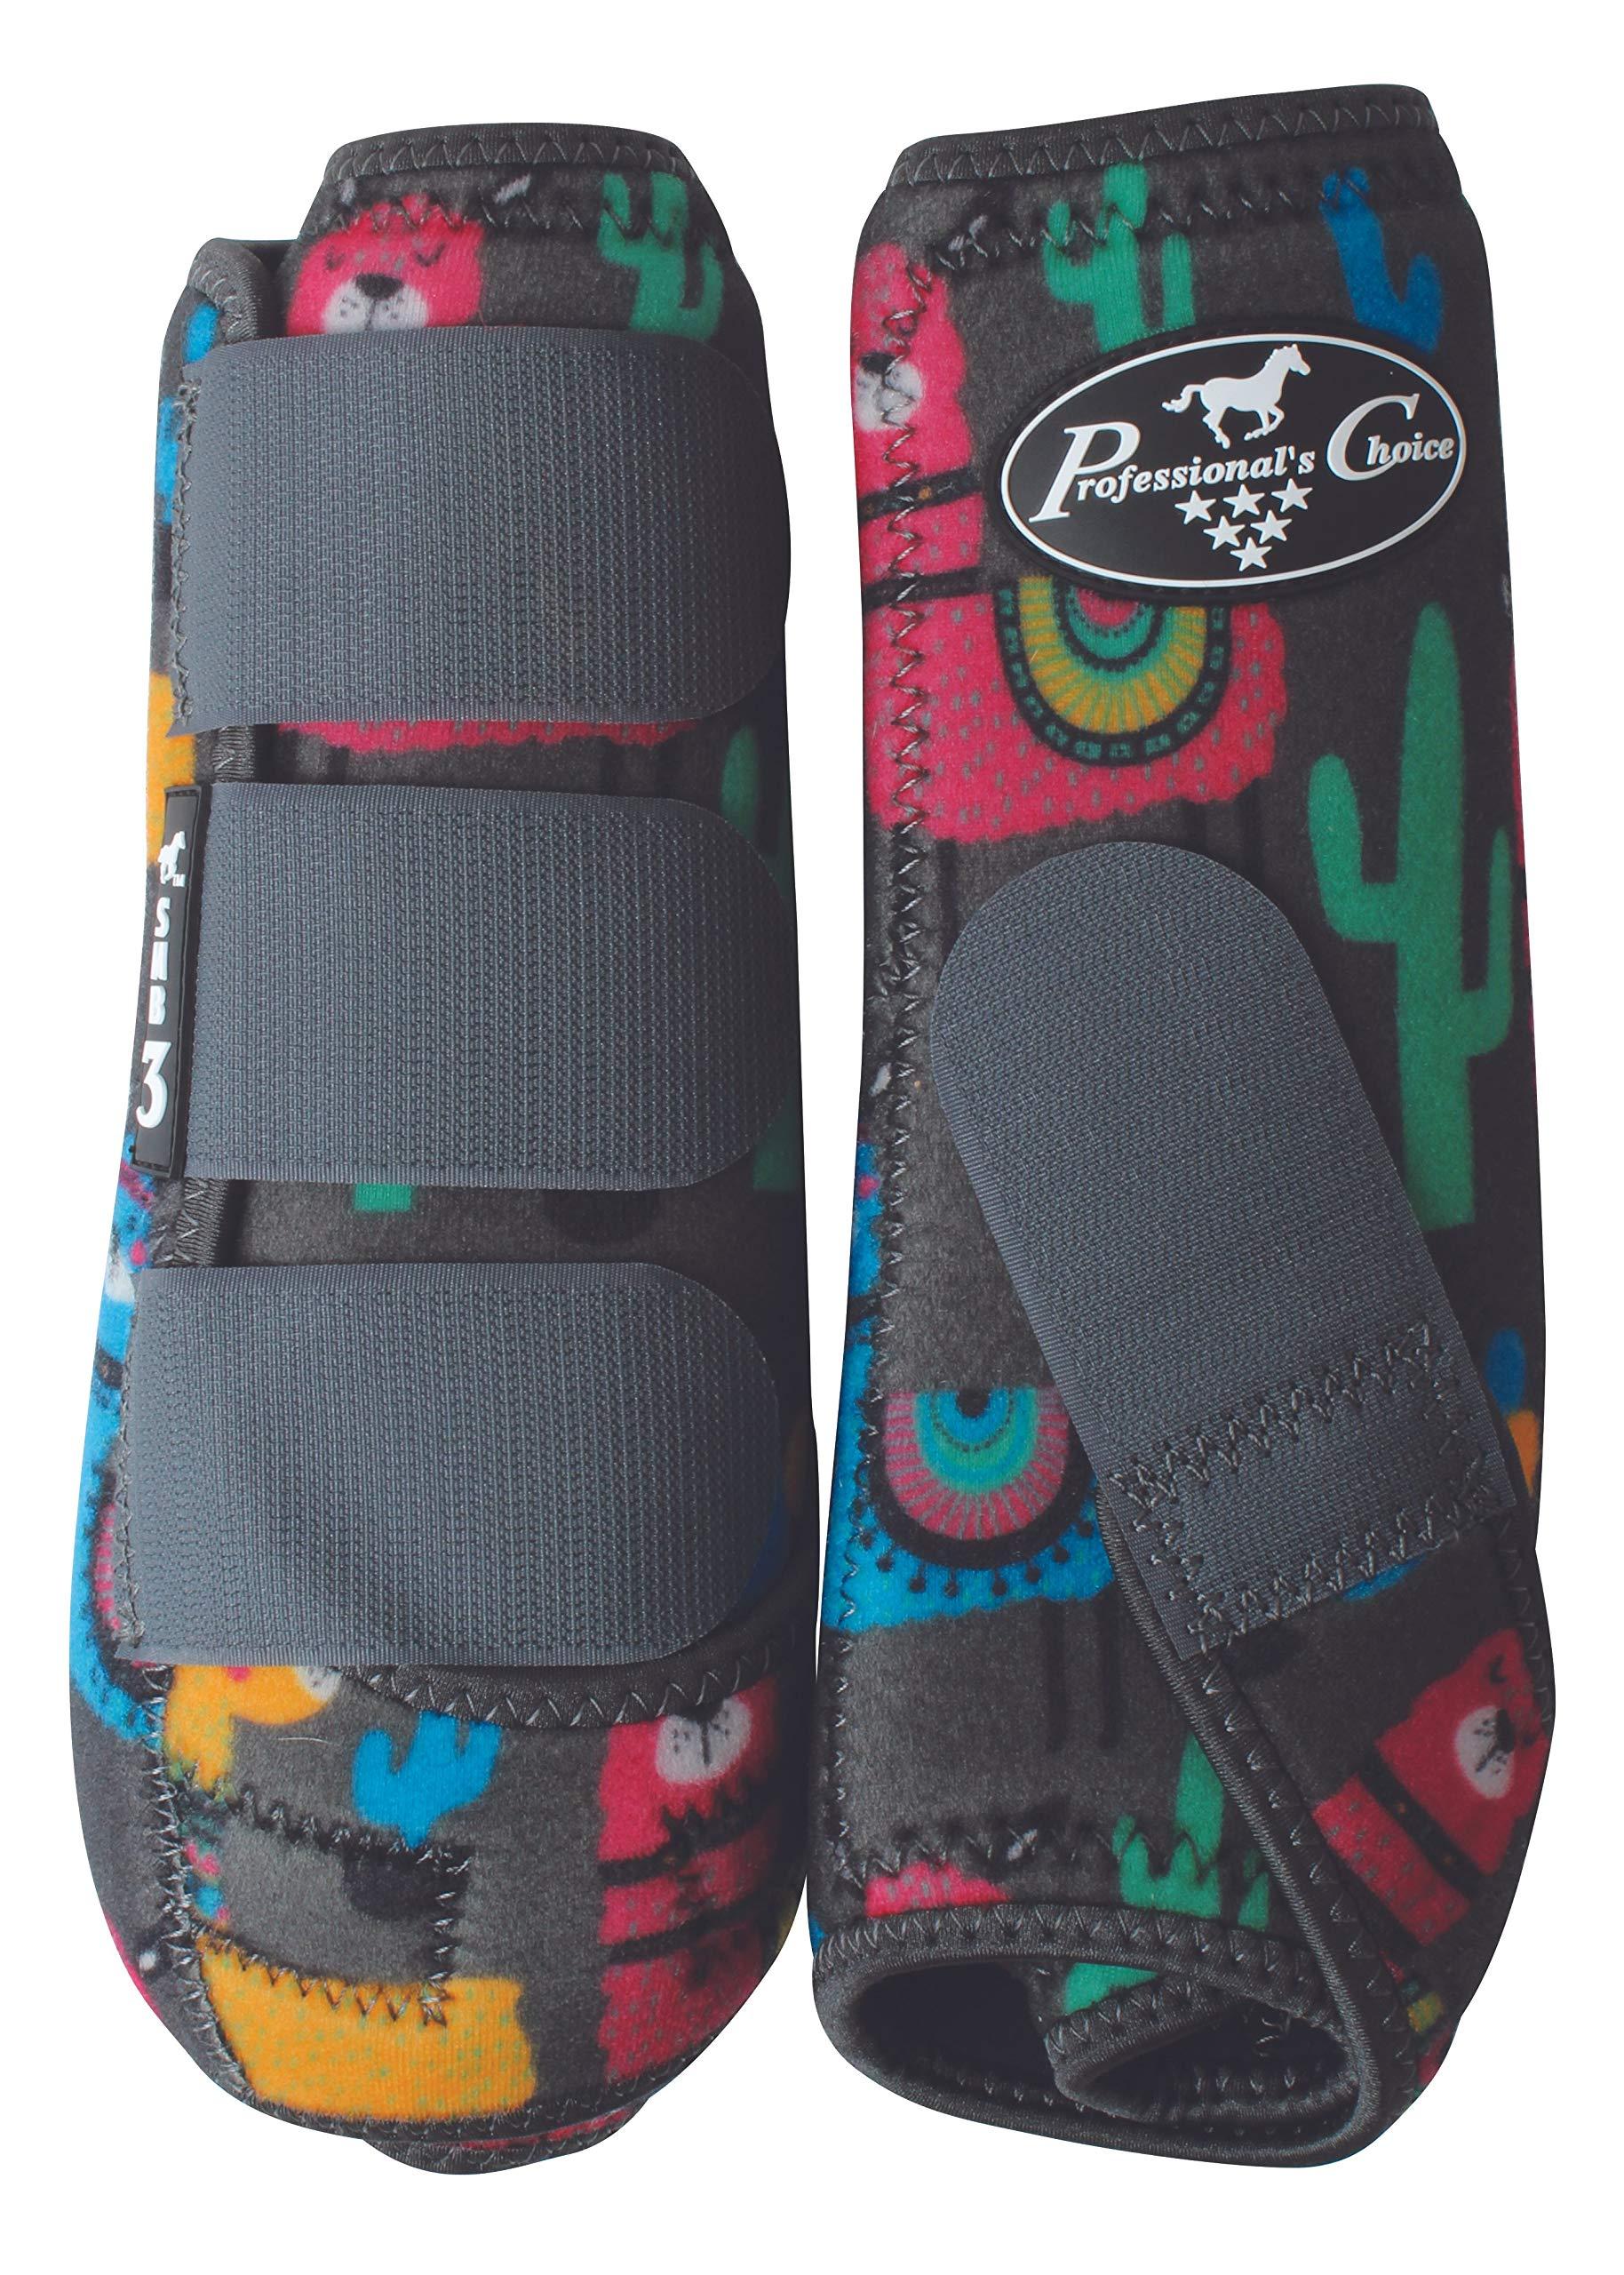 Professional's Choice SMB3 2-PK Boots Sml Llama